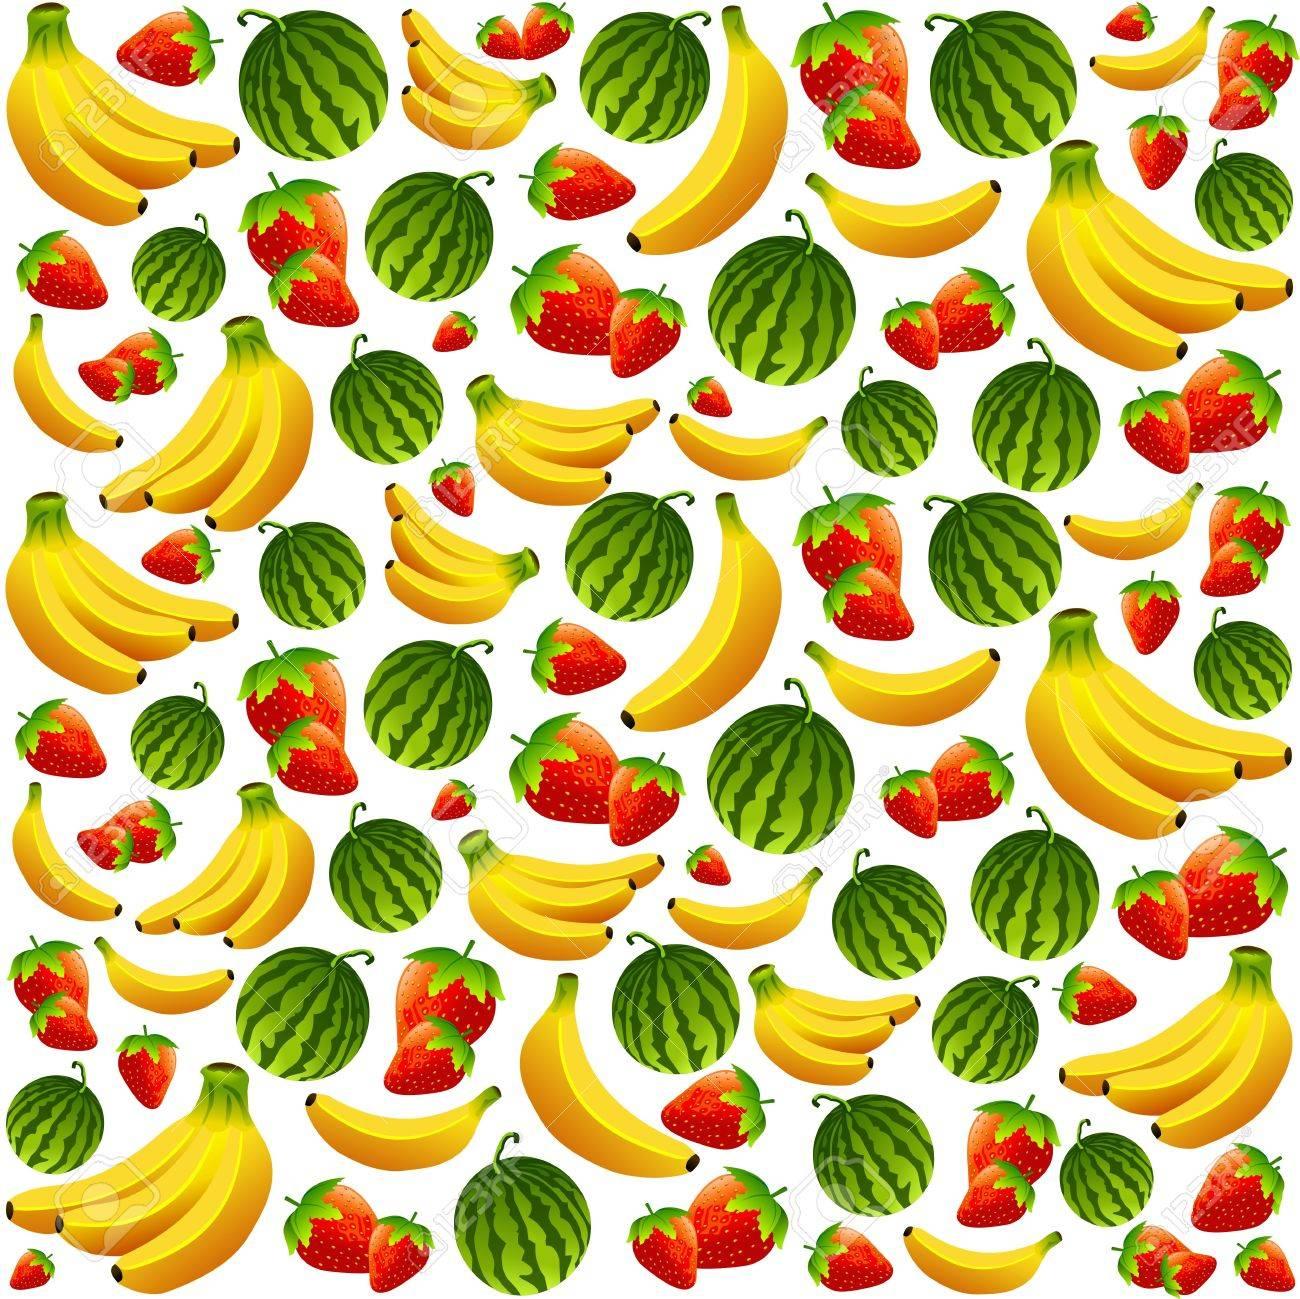 Fresh Summer Fruits Pattern Background Stock Vector - 18596662